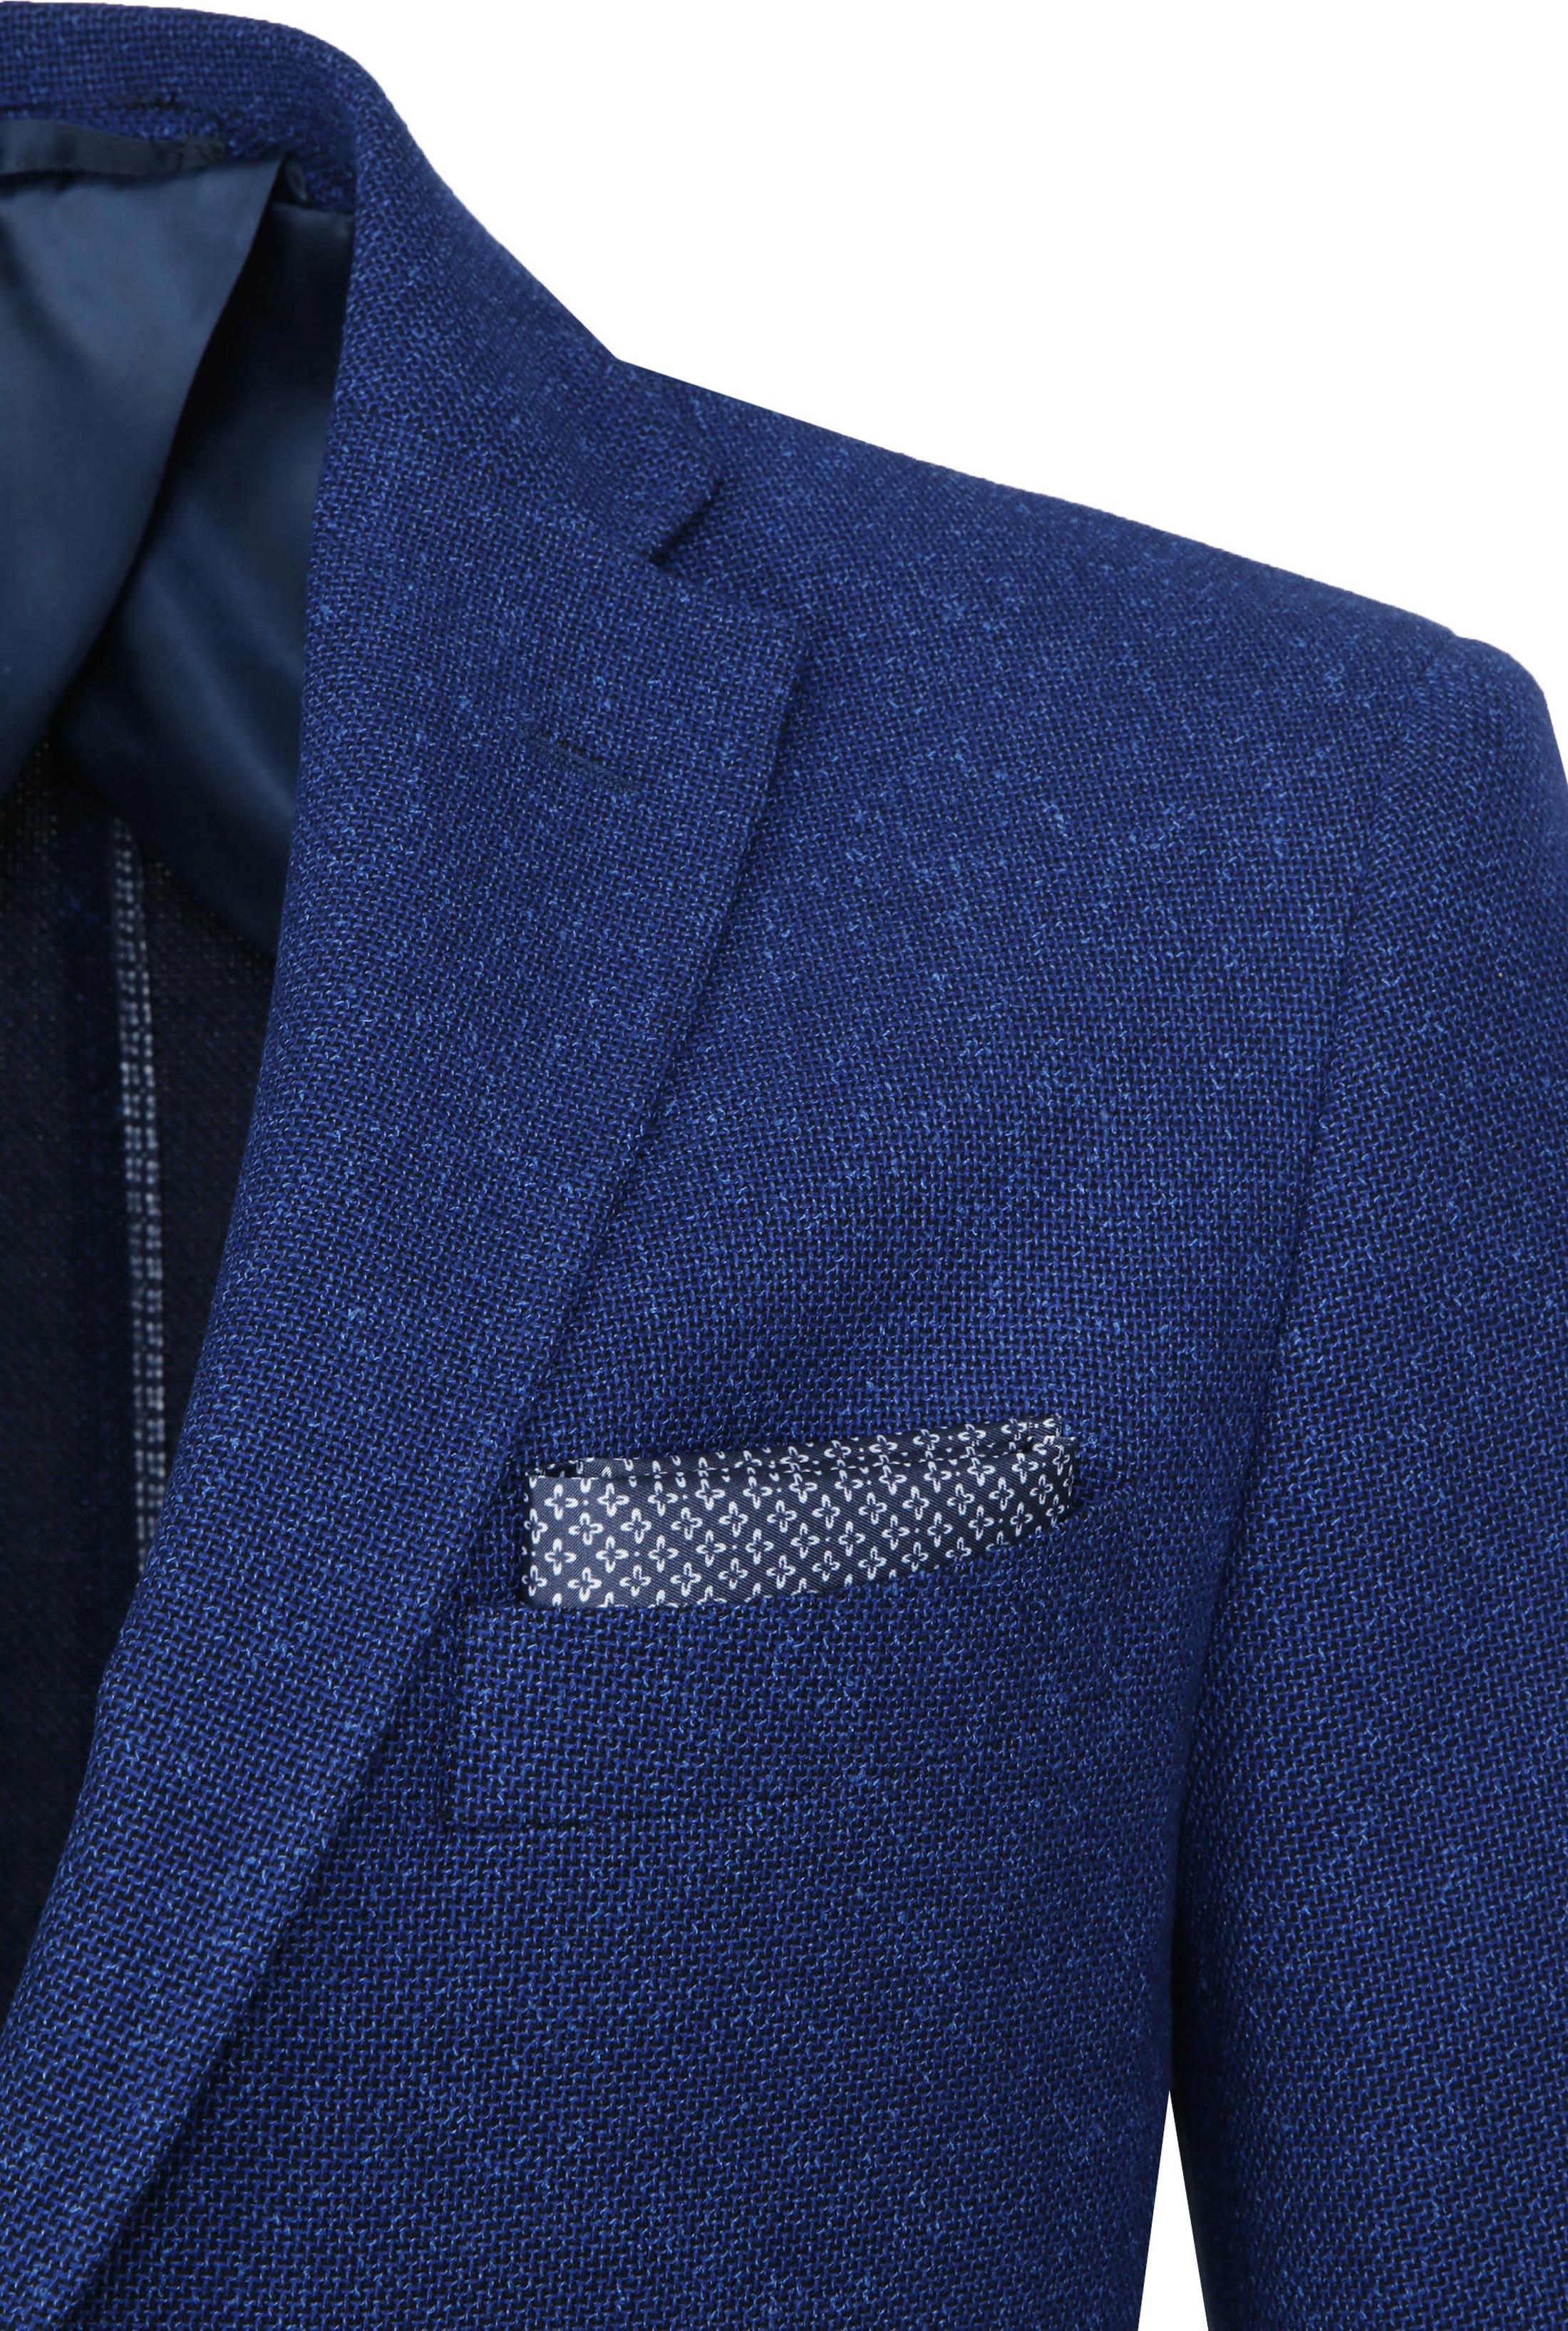 Suitable Blazer Pylos Blue foto 1